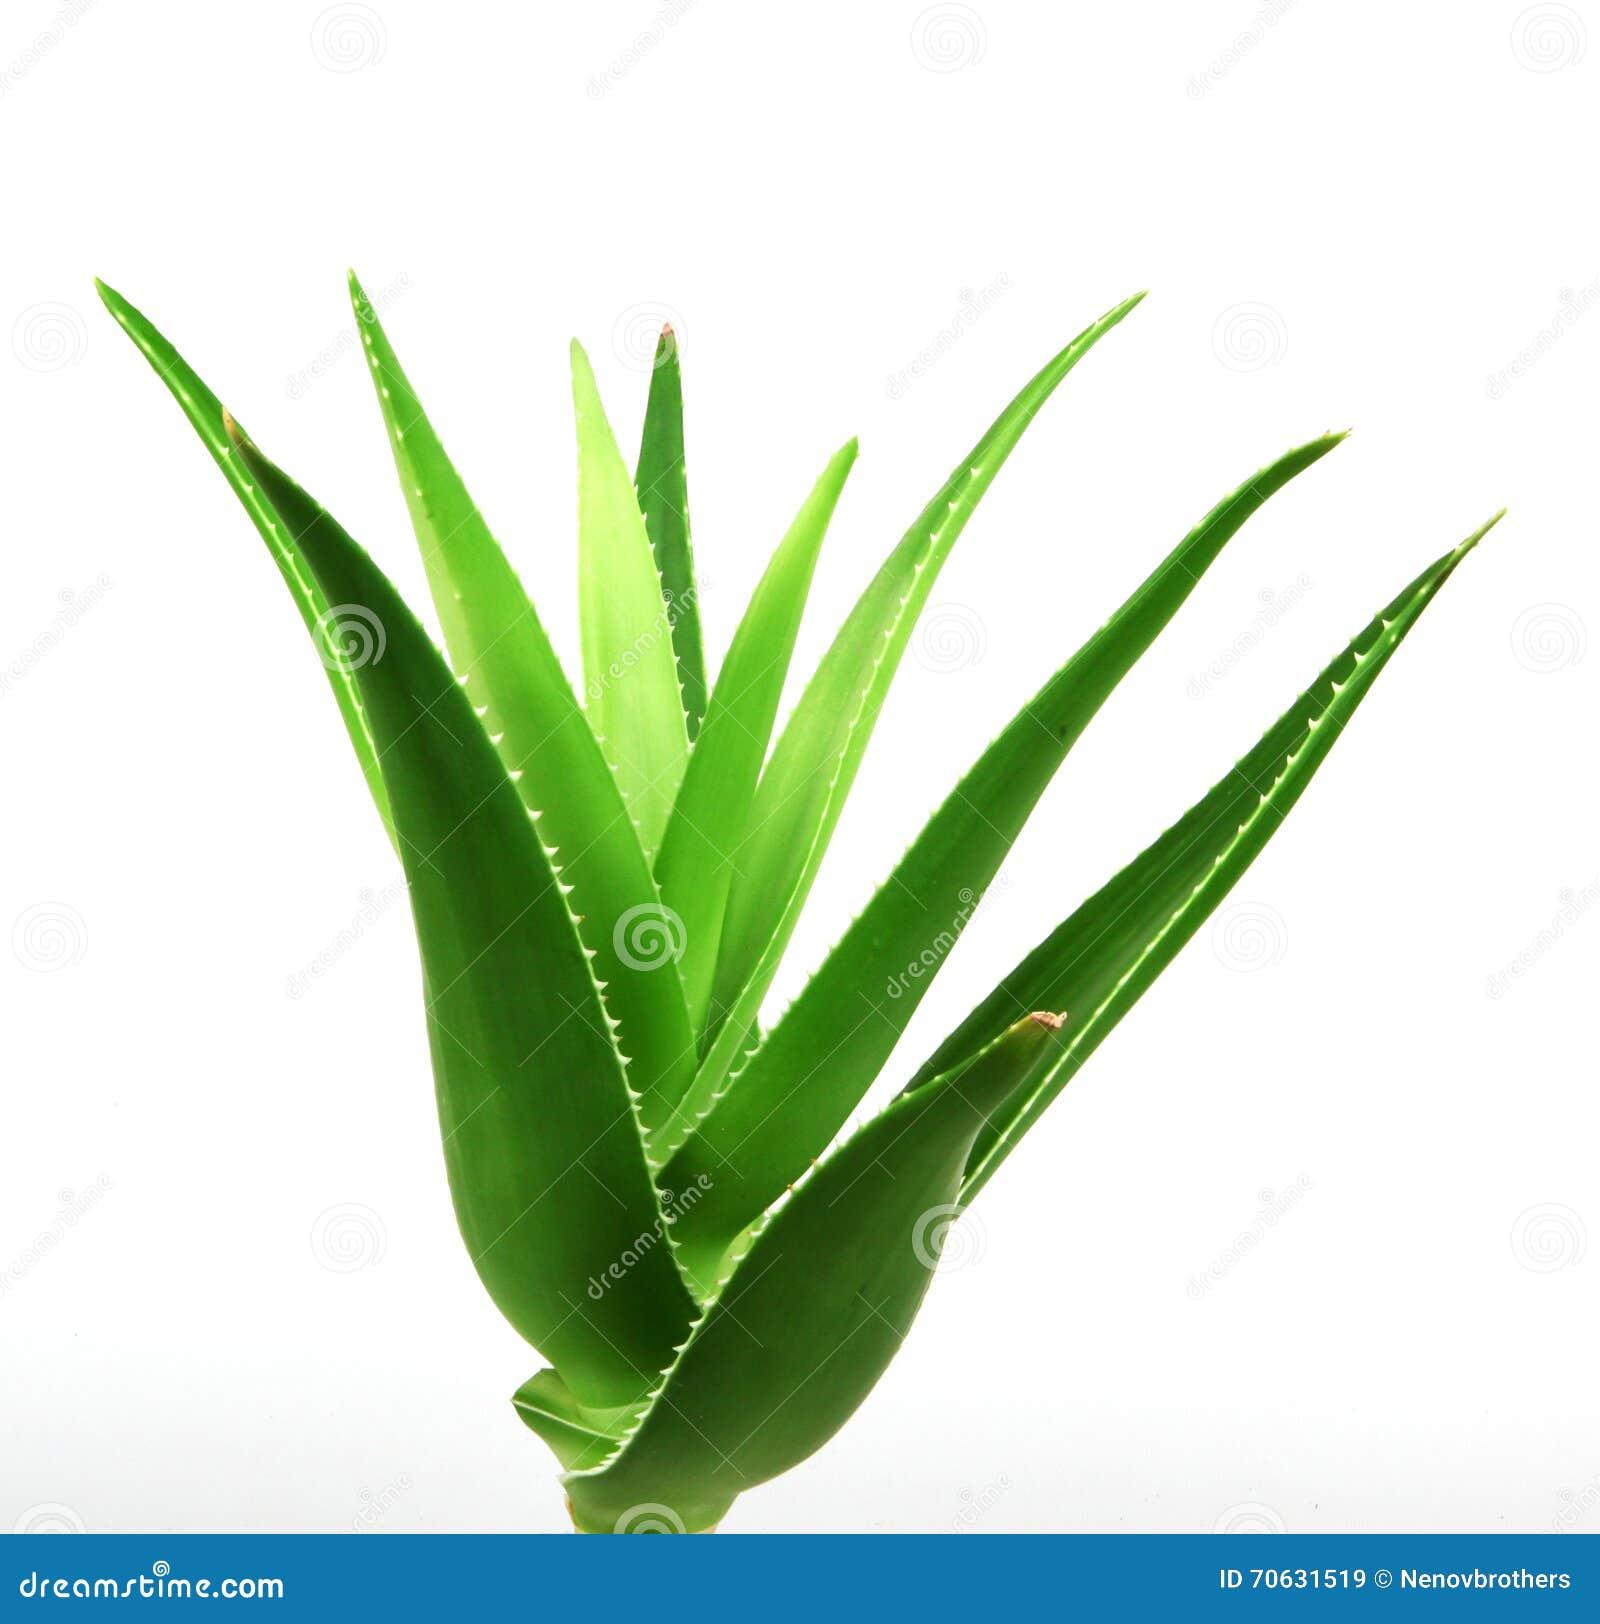 aloe vera plant isolated on white stock image image of botany healthy 70631519. Black Bedroom Furniture Sets. Home Design Ideas